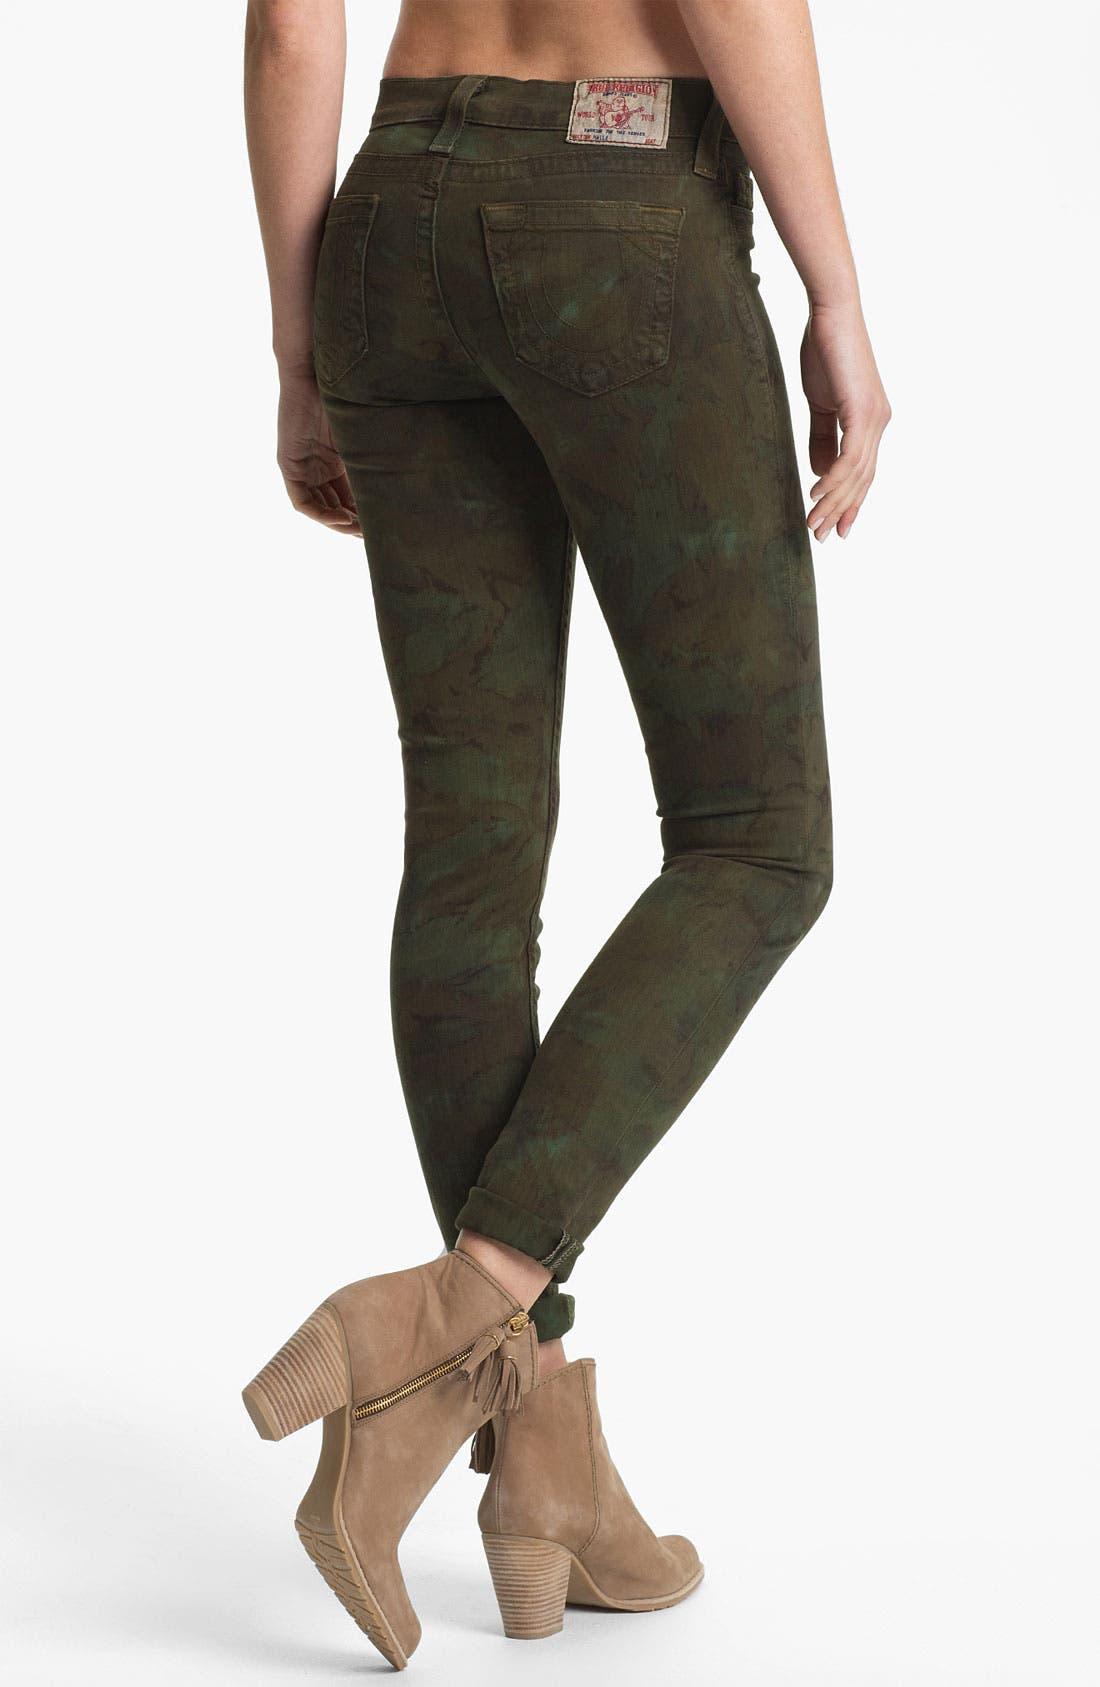 Alternate Image 2  - True Religion Brand Jeans 'Halle' Skinny Stretch Jeans (Military)